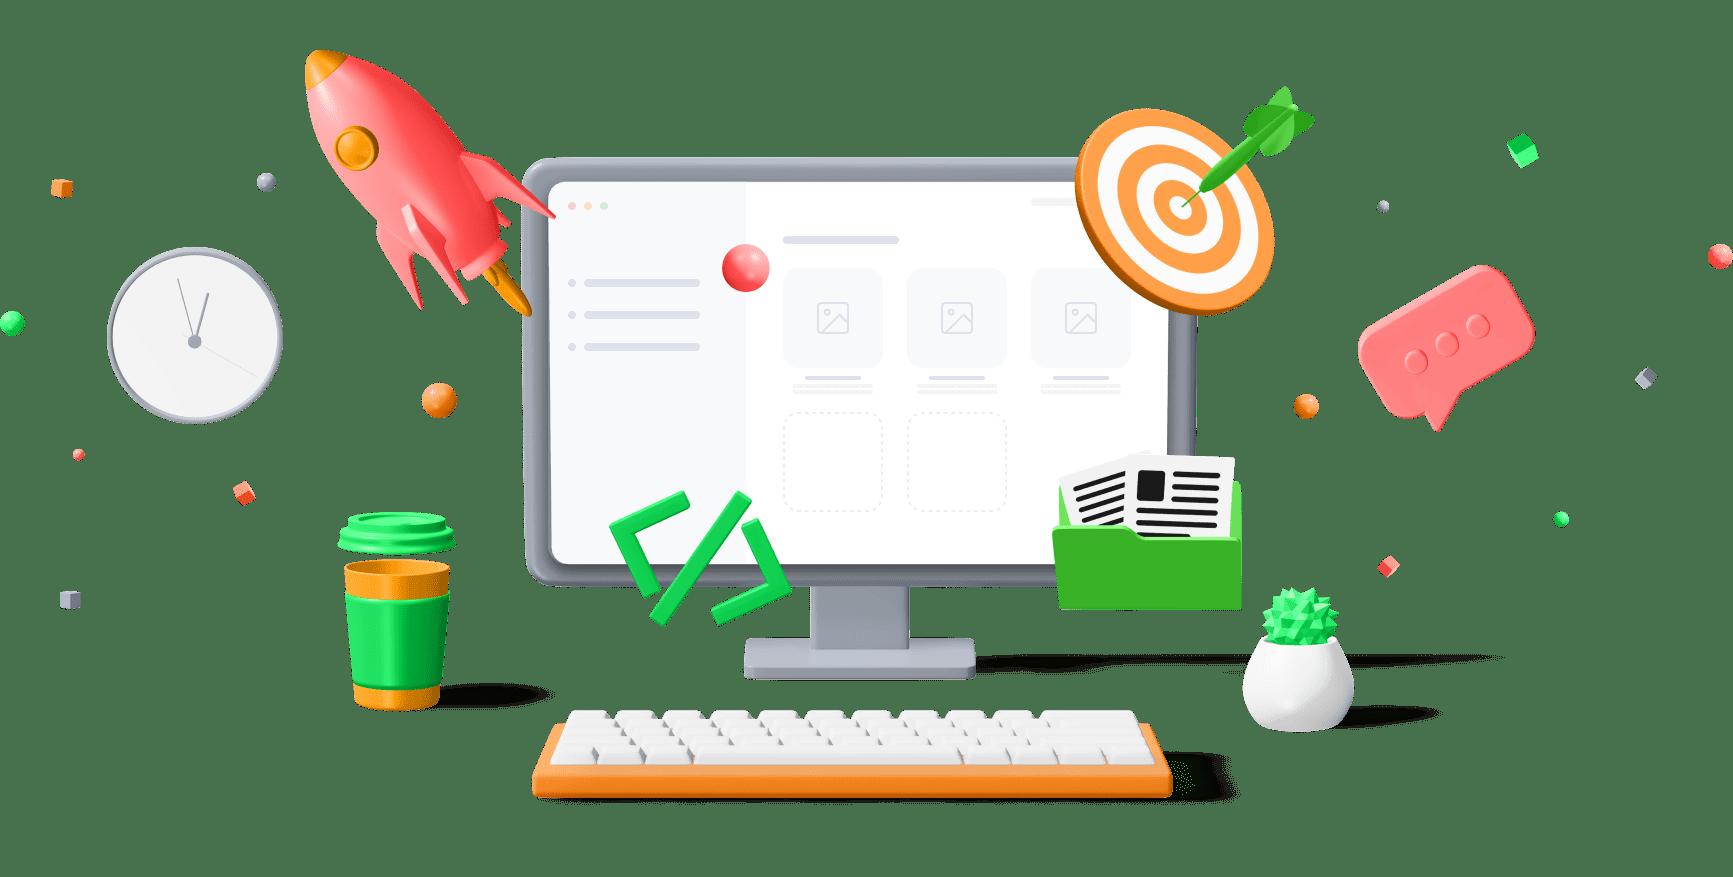 Tvorba e-shopů na eshop-rychle na míru